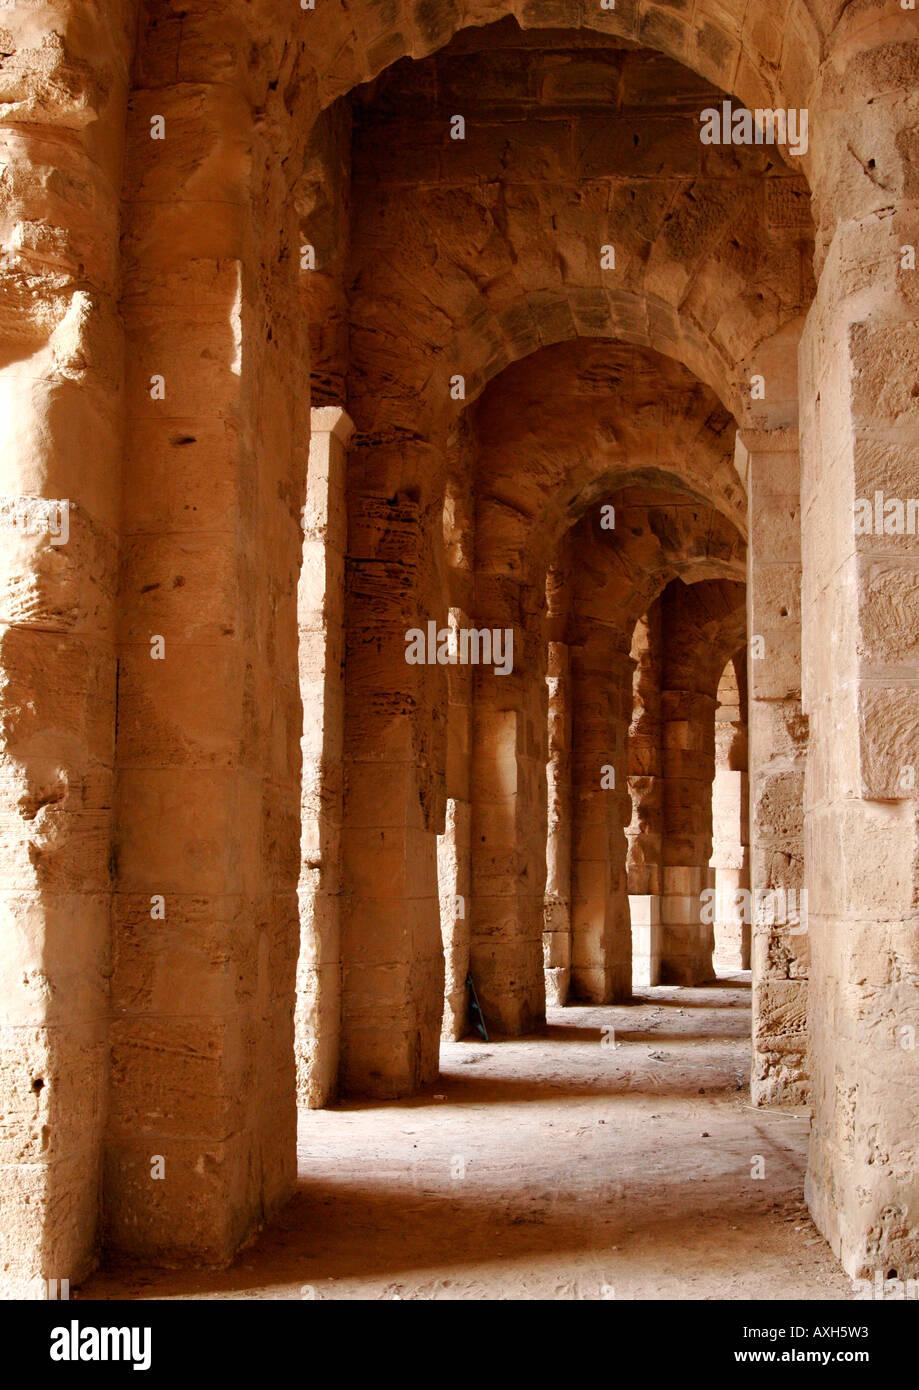 The great archway coridoor surrounding the Roman Amphitheatre of El Jem, Tunisia. - Stock Image